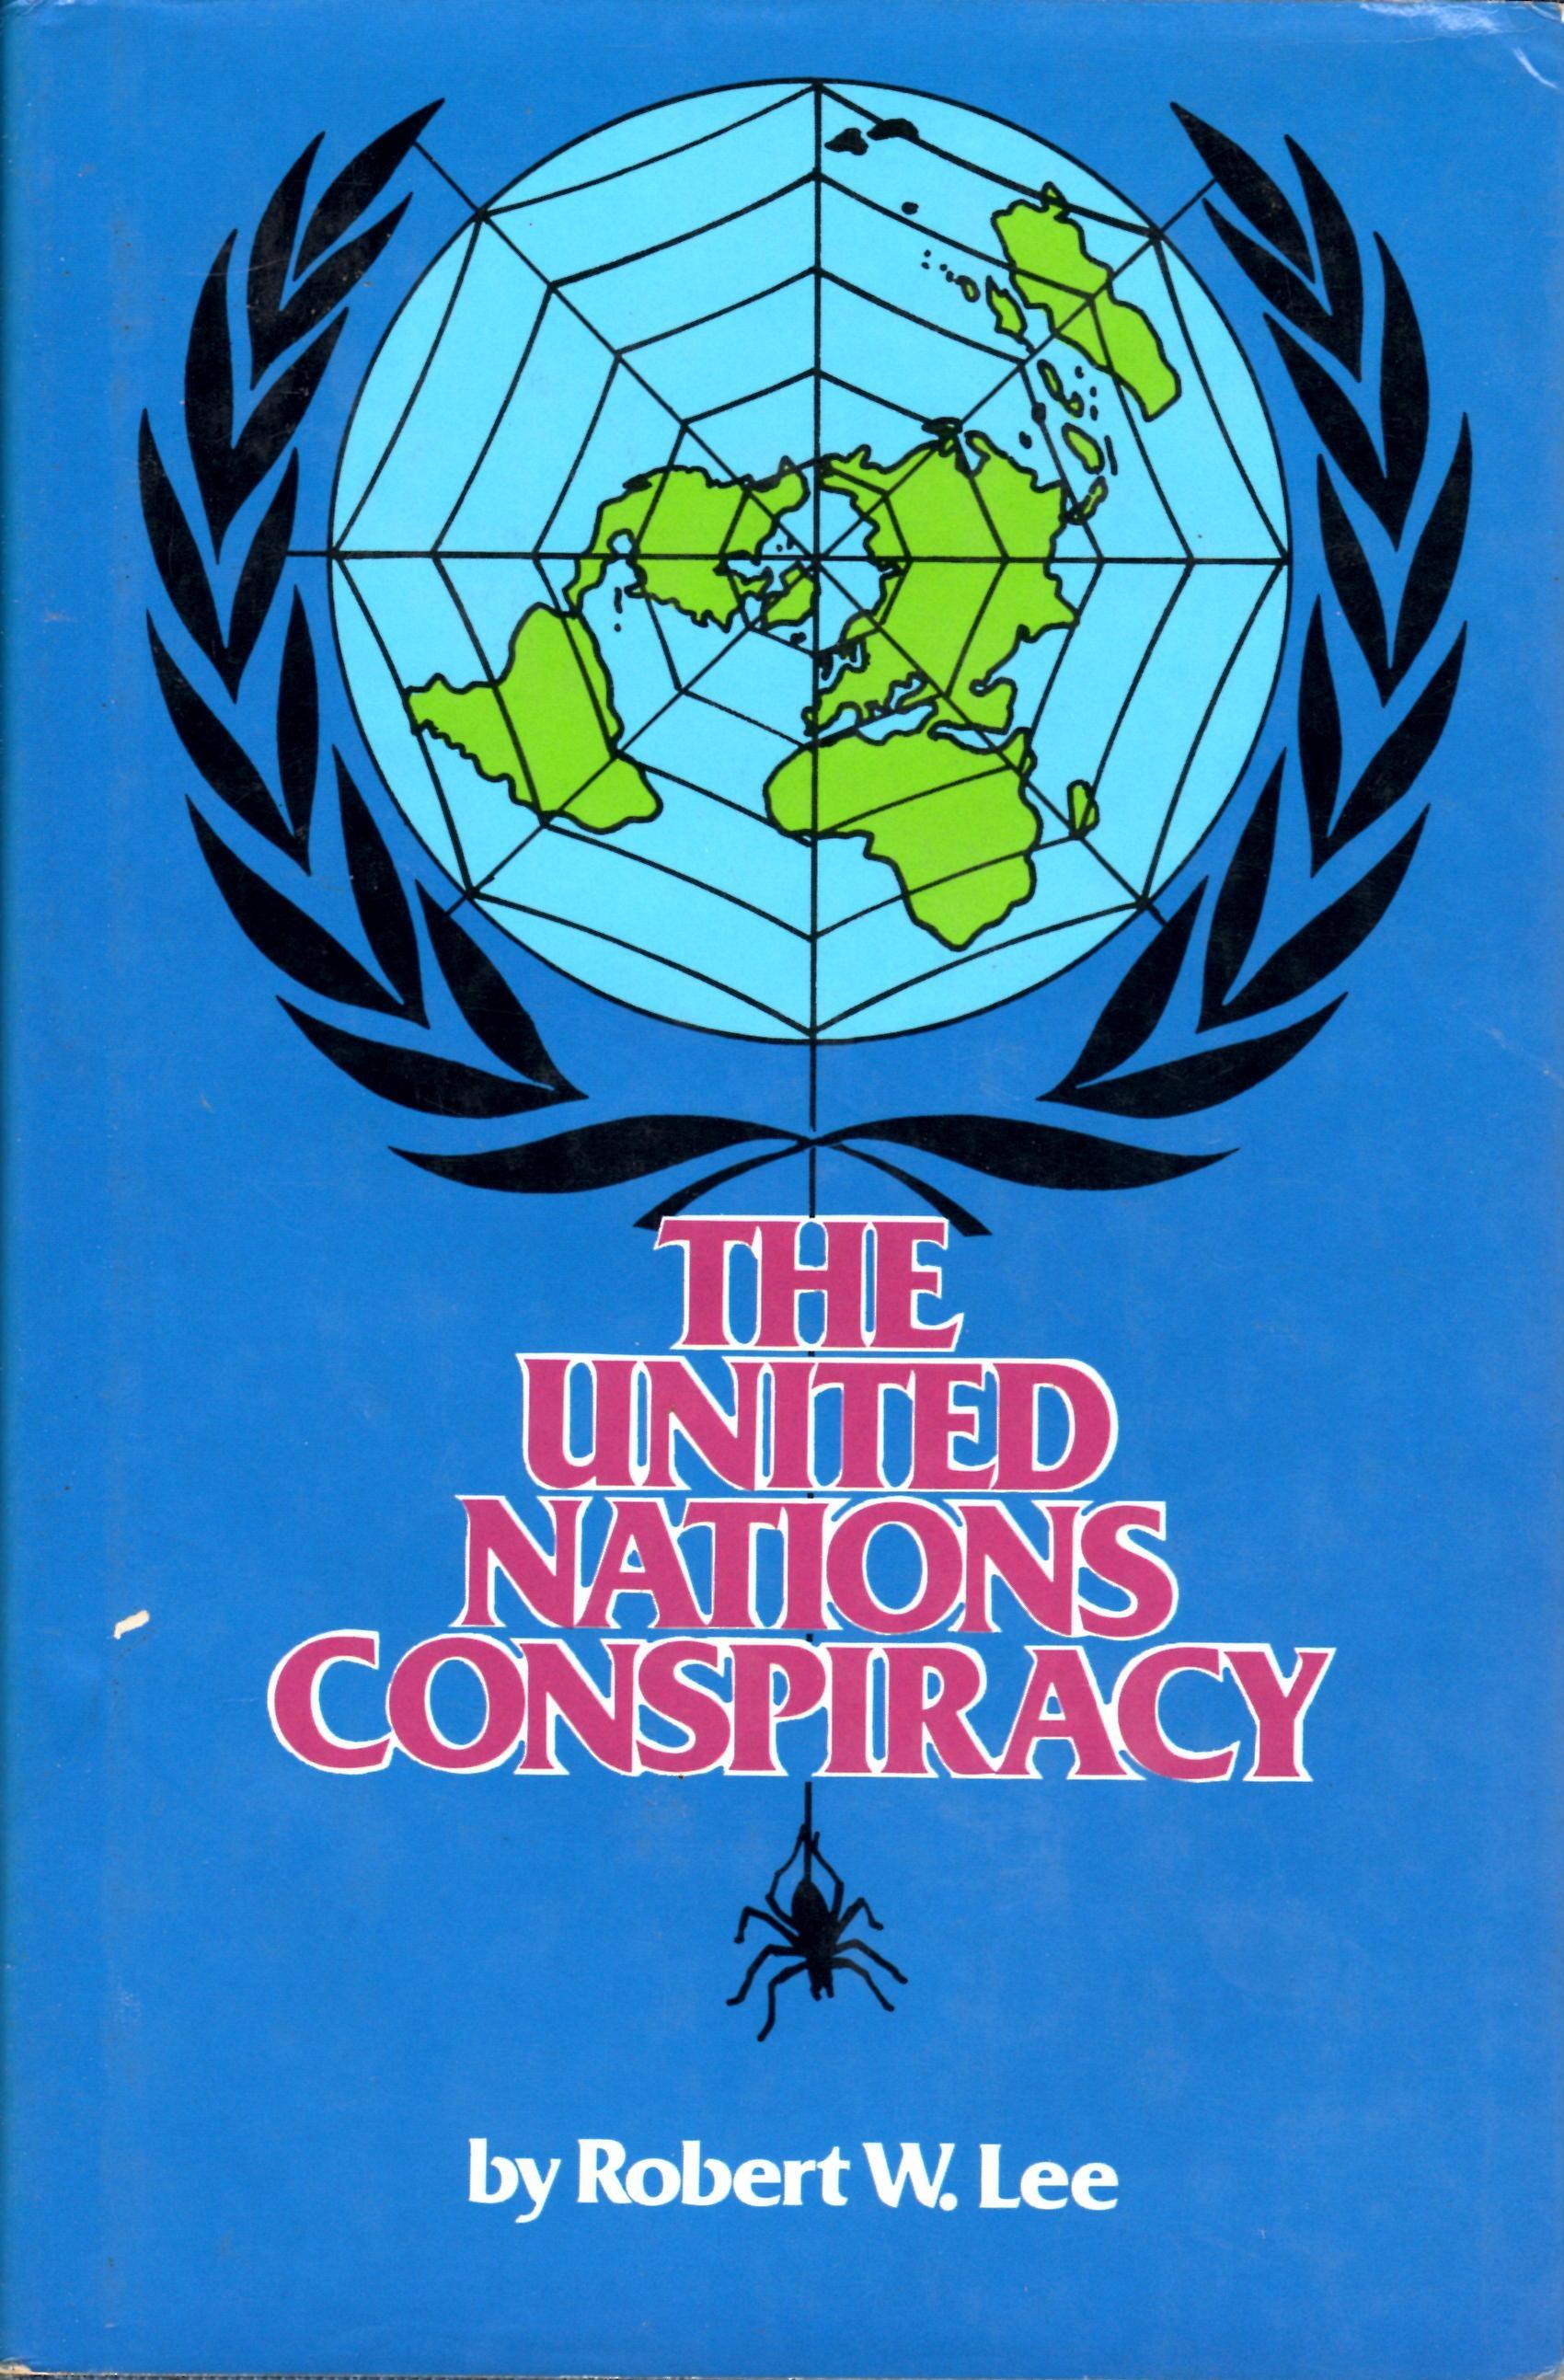 UnitedNationsConspiracyBST